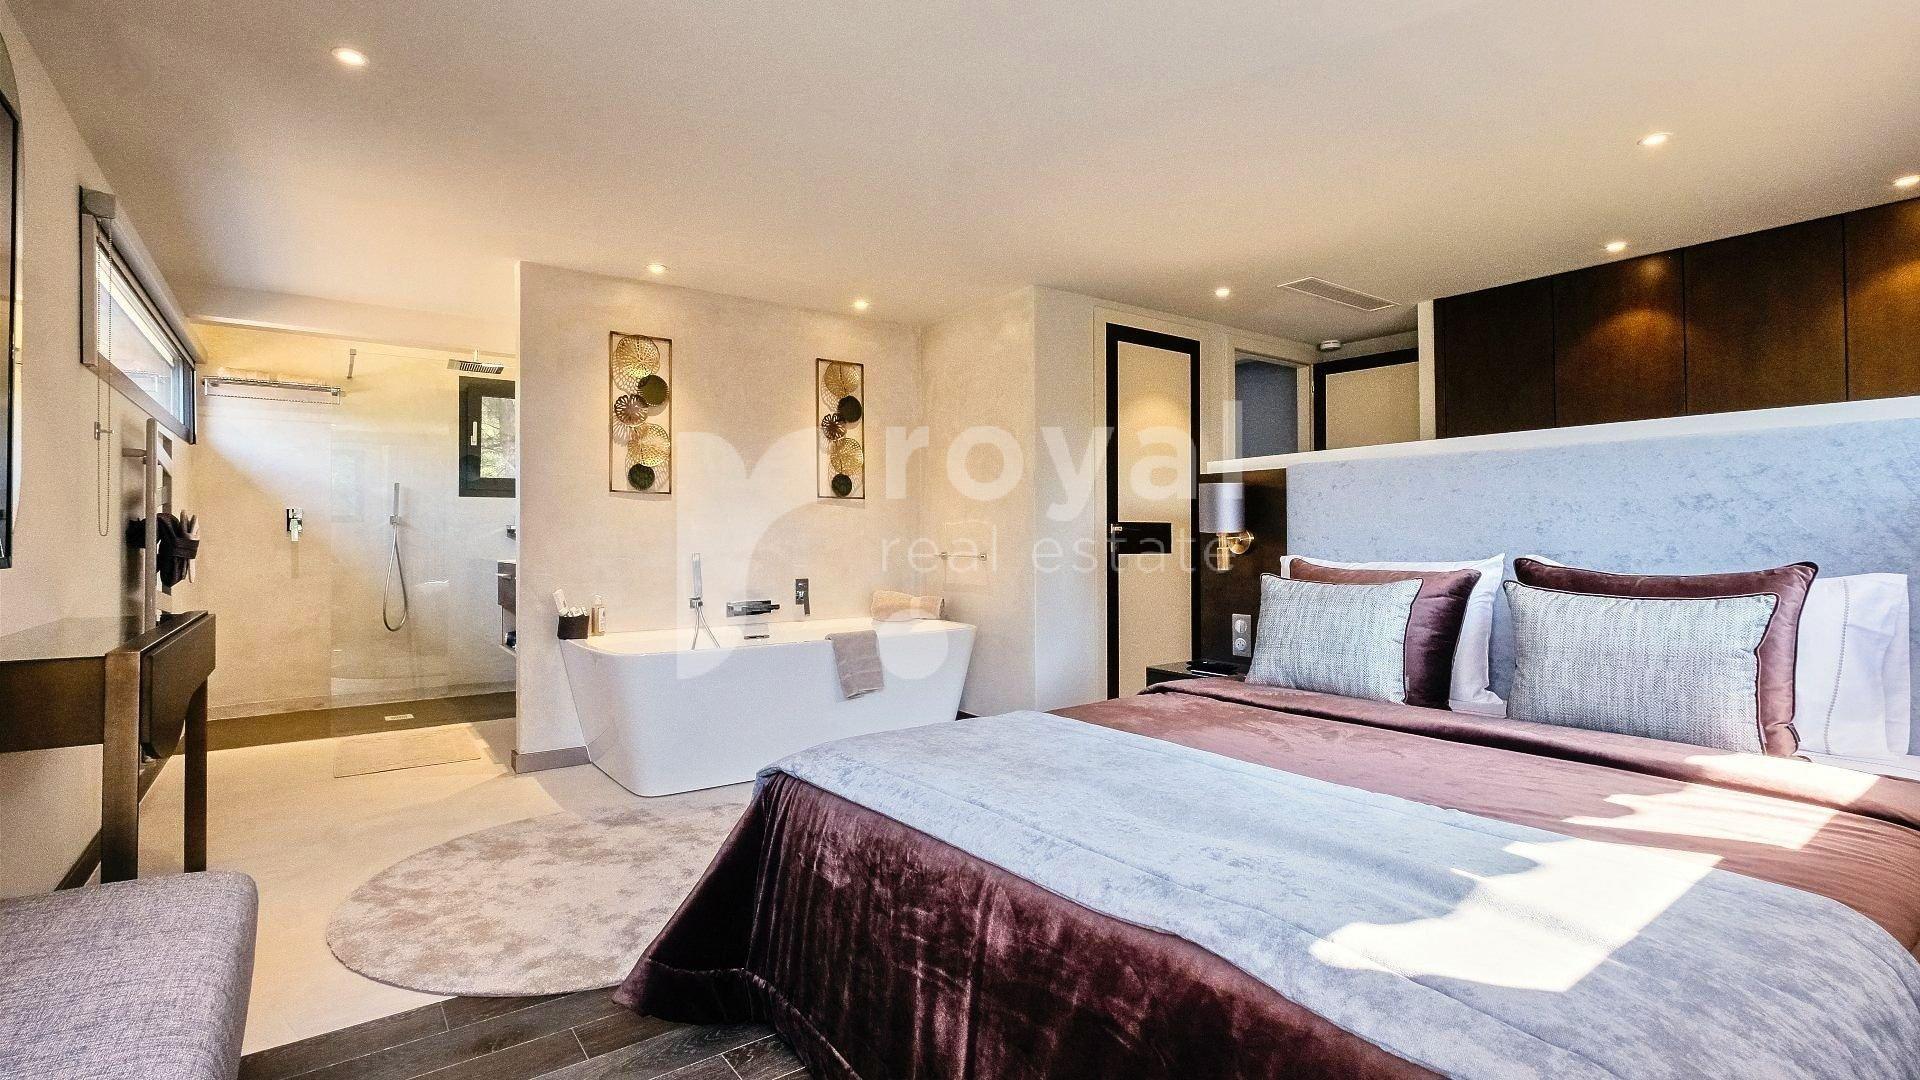 Villa for seasonnal rent in Opio